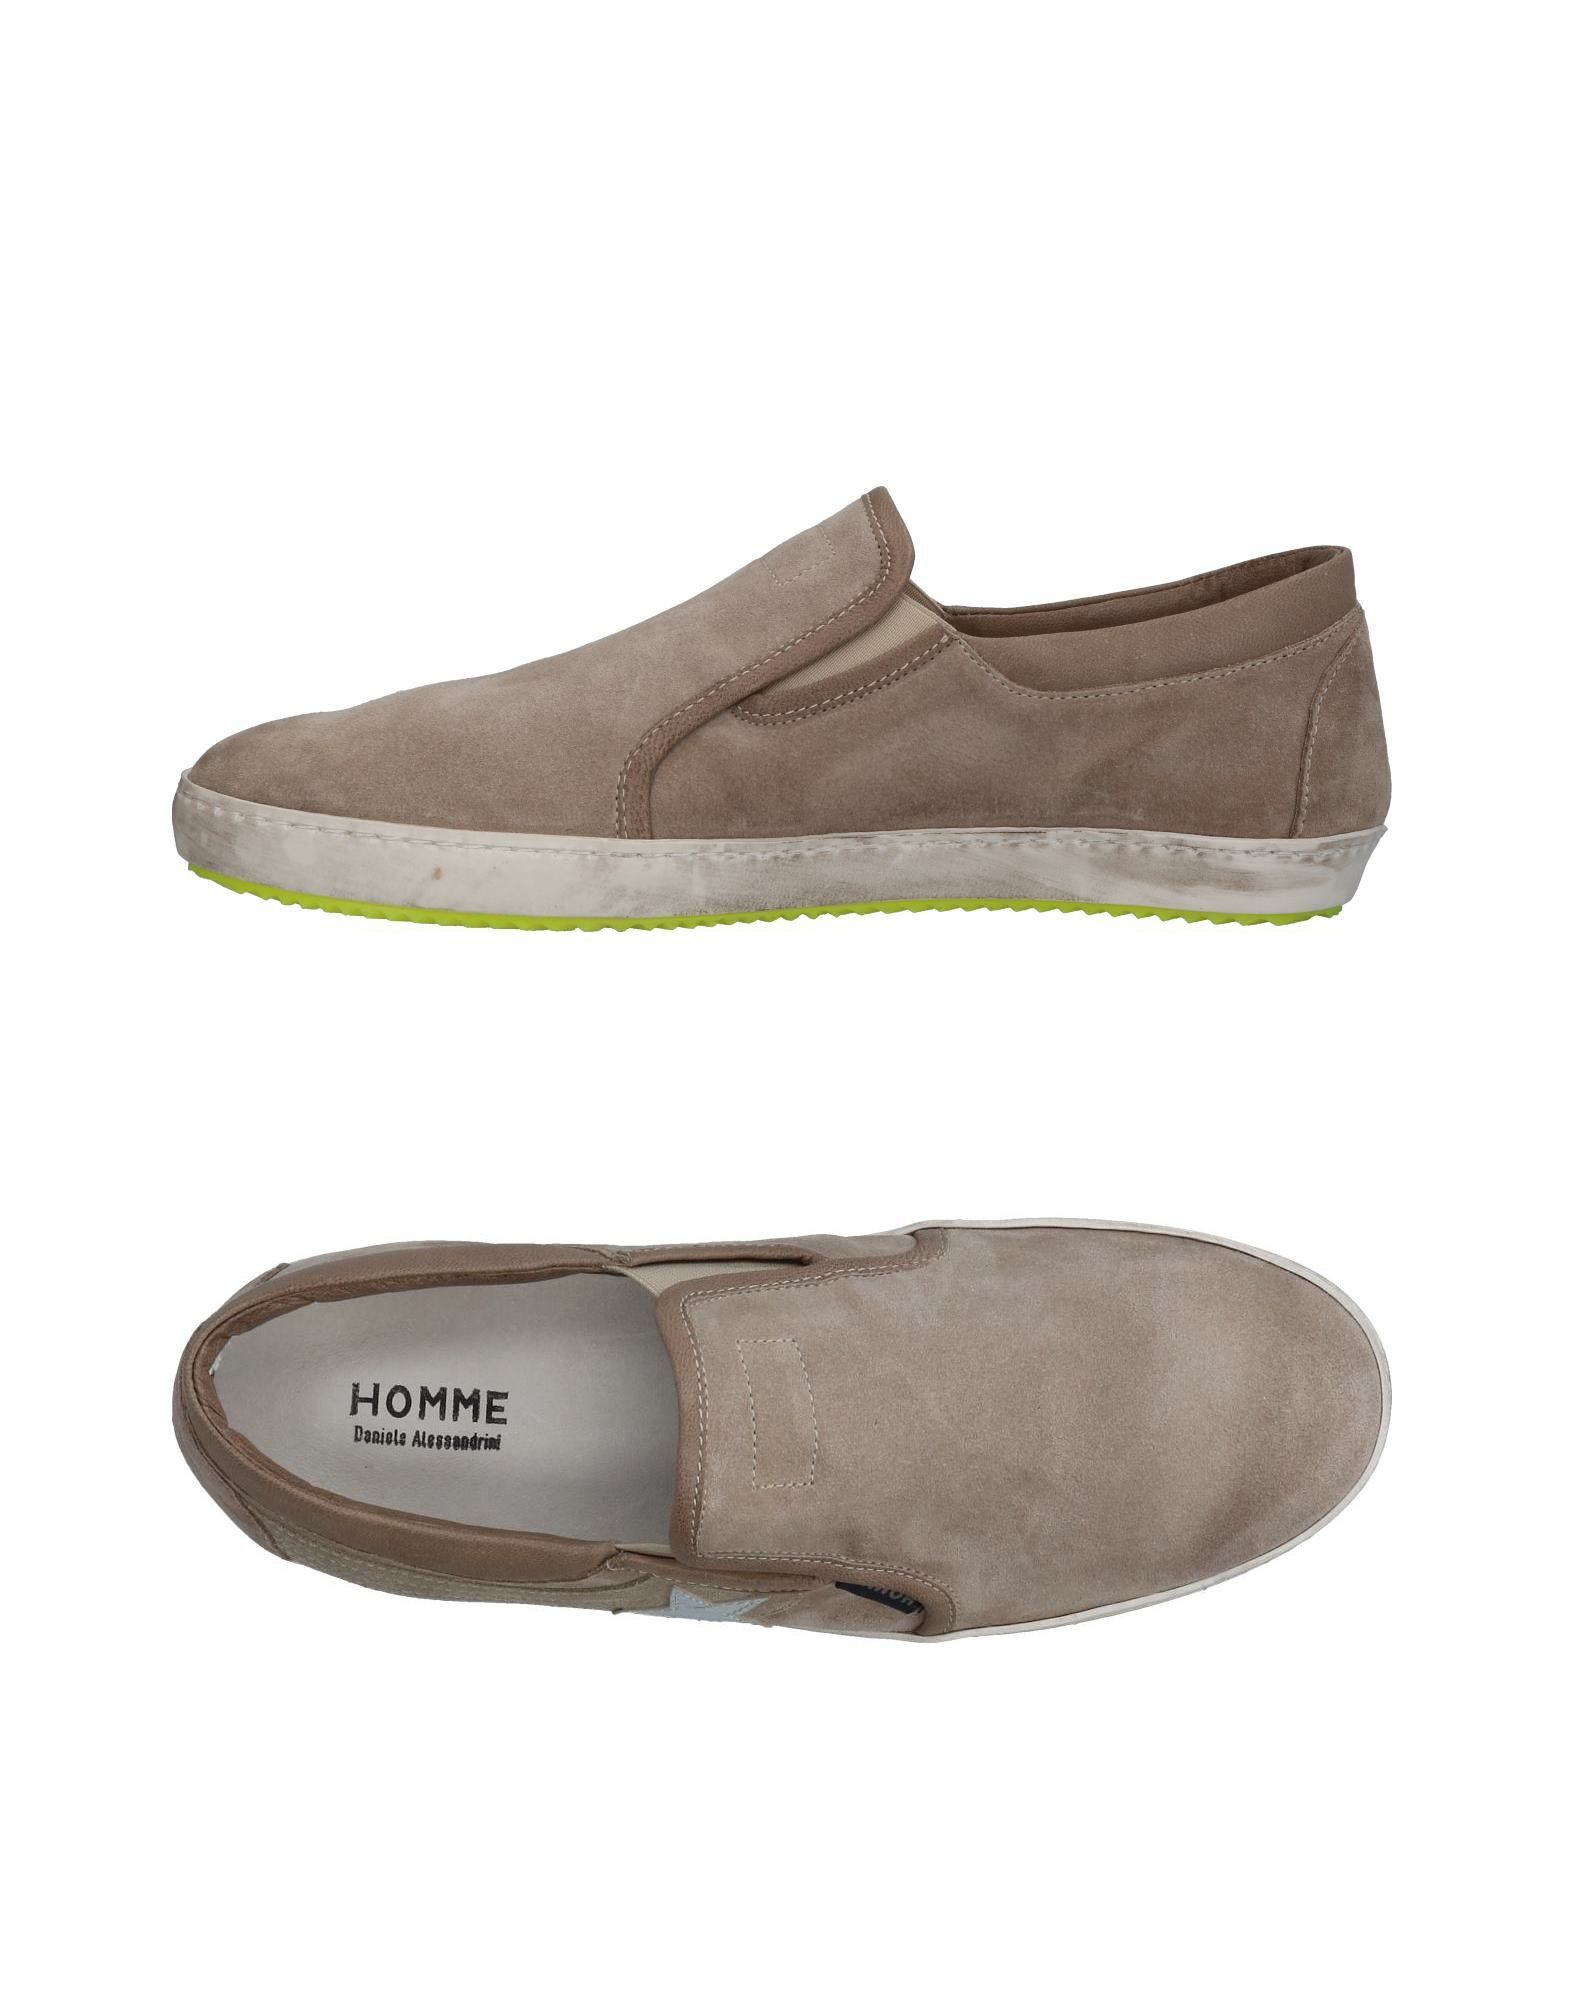 Sneakers Daniele Alessandrini Homme Homme - Sneakers Daniele Alessandrini Homme sur